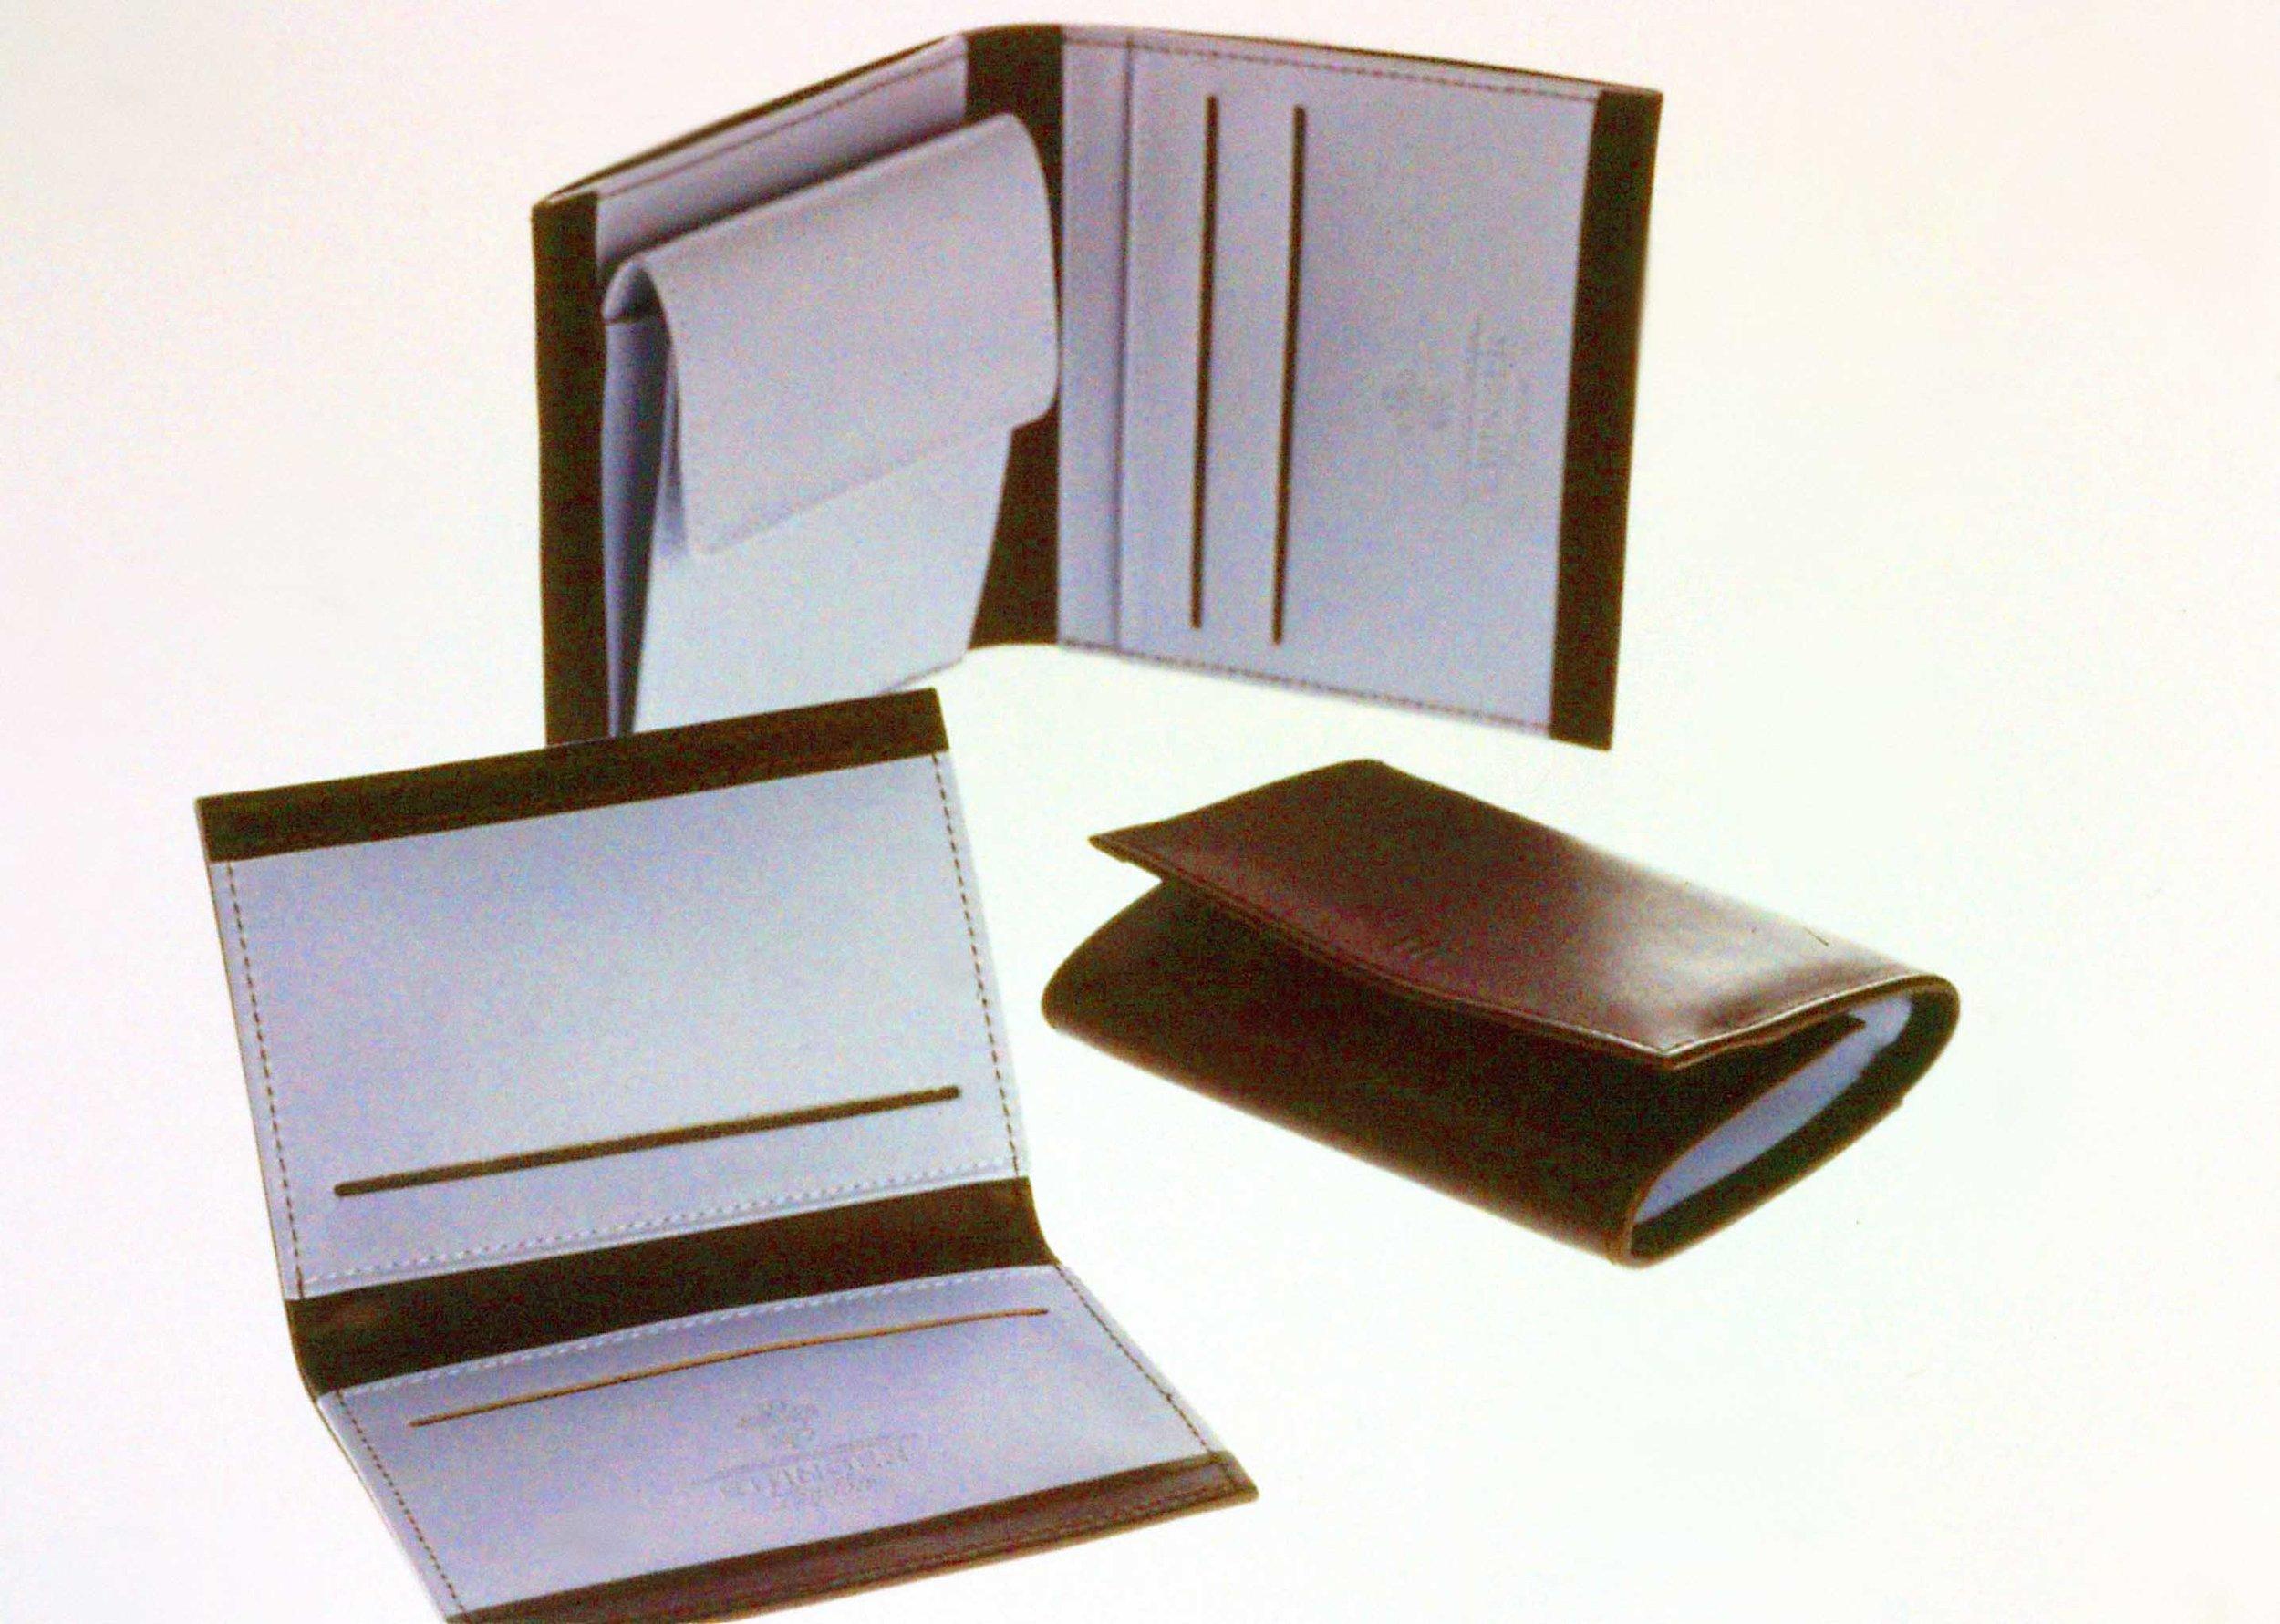 Ettinger x Pearson Lloyd wallets